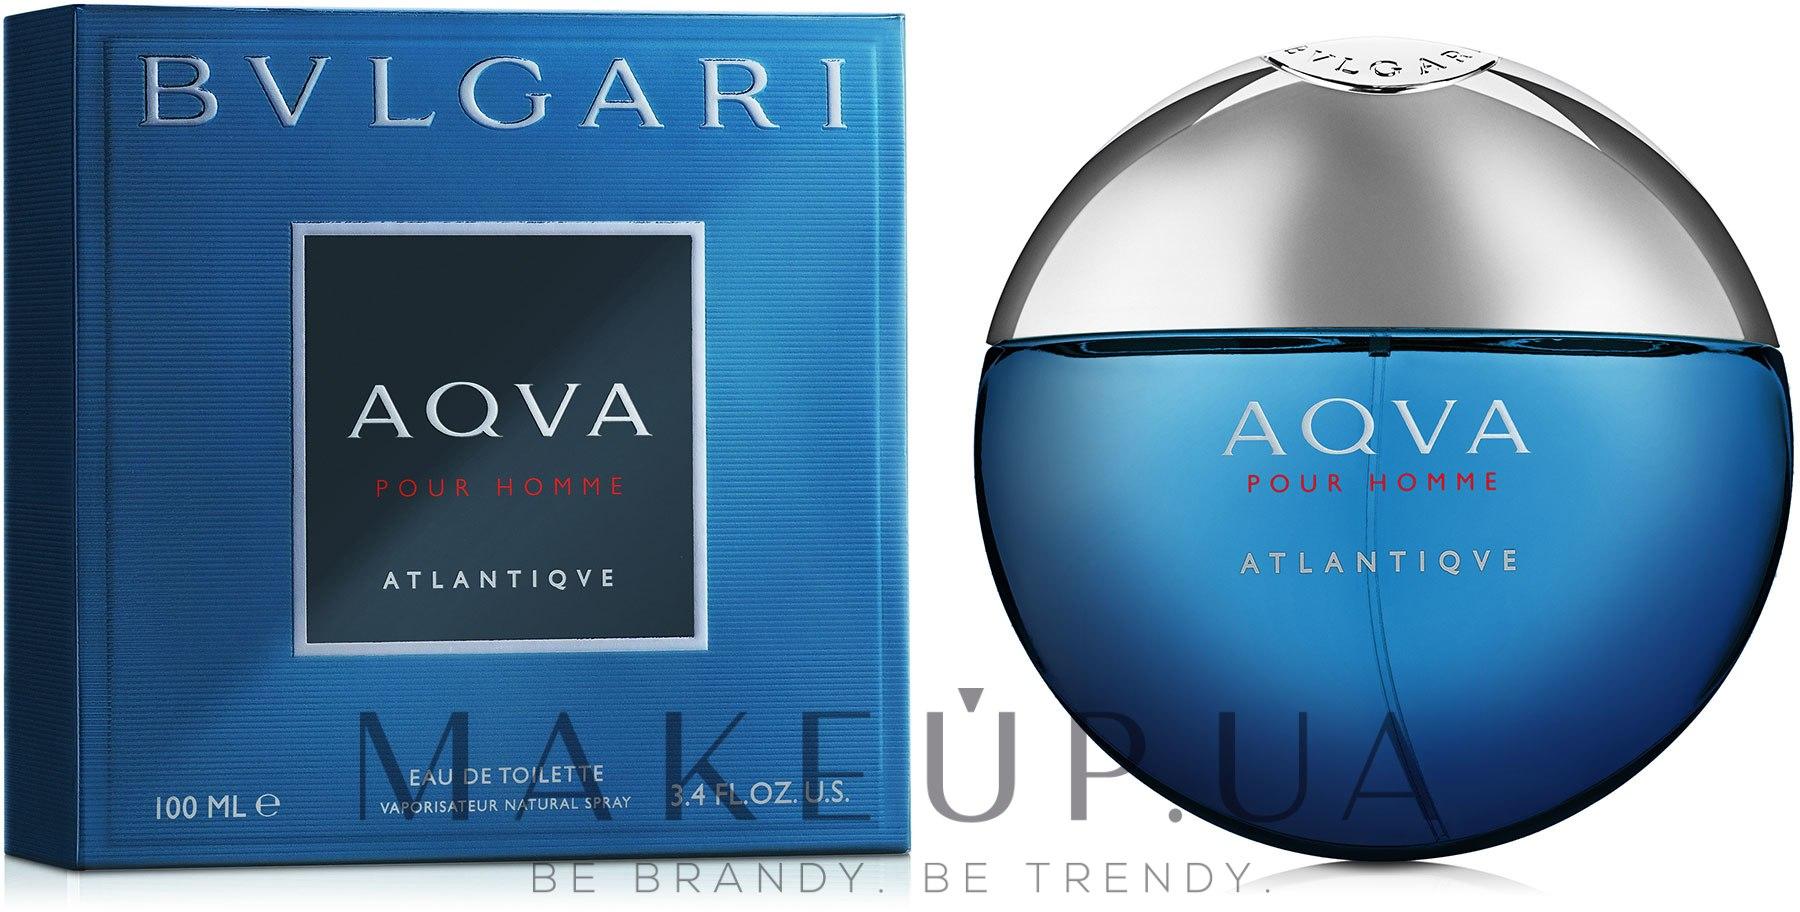 Makeup Bvlgari Aqva Pour Homme Atlantiqve туалетная вода купить